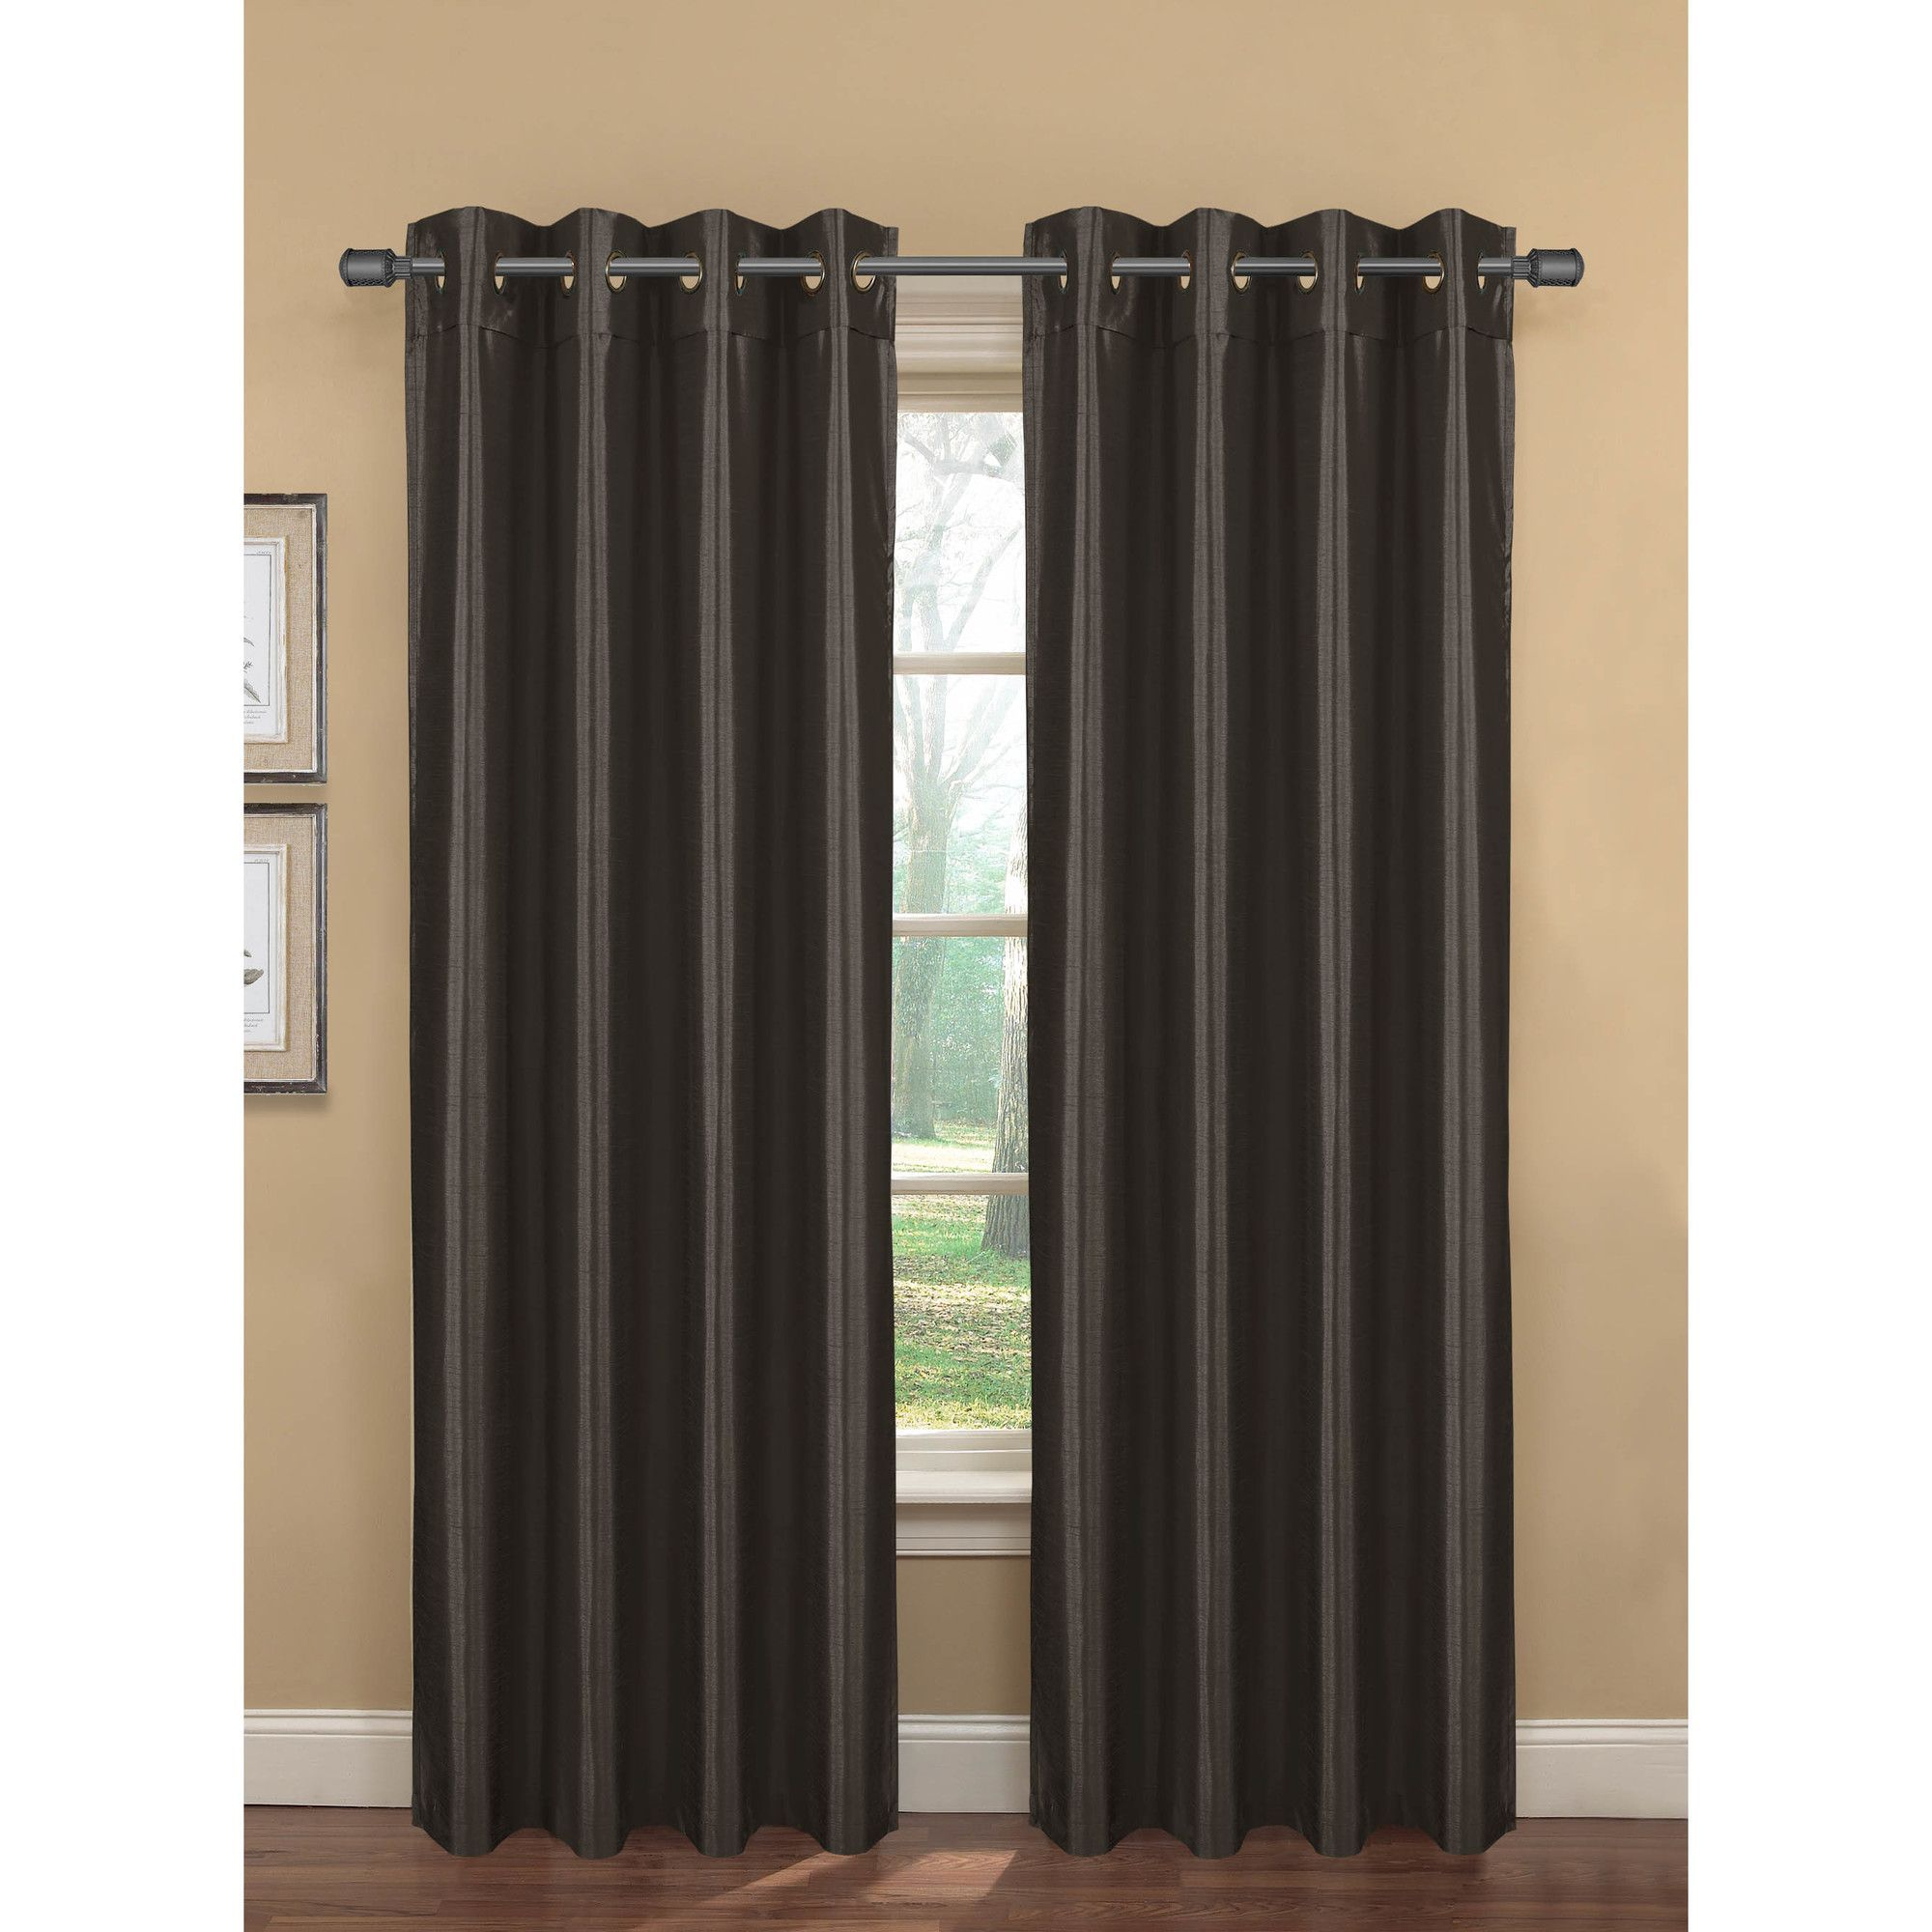 Bliss Faux Silk Room Darkening Curtain Panels Panel Curtains